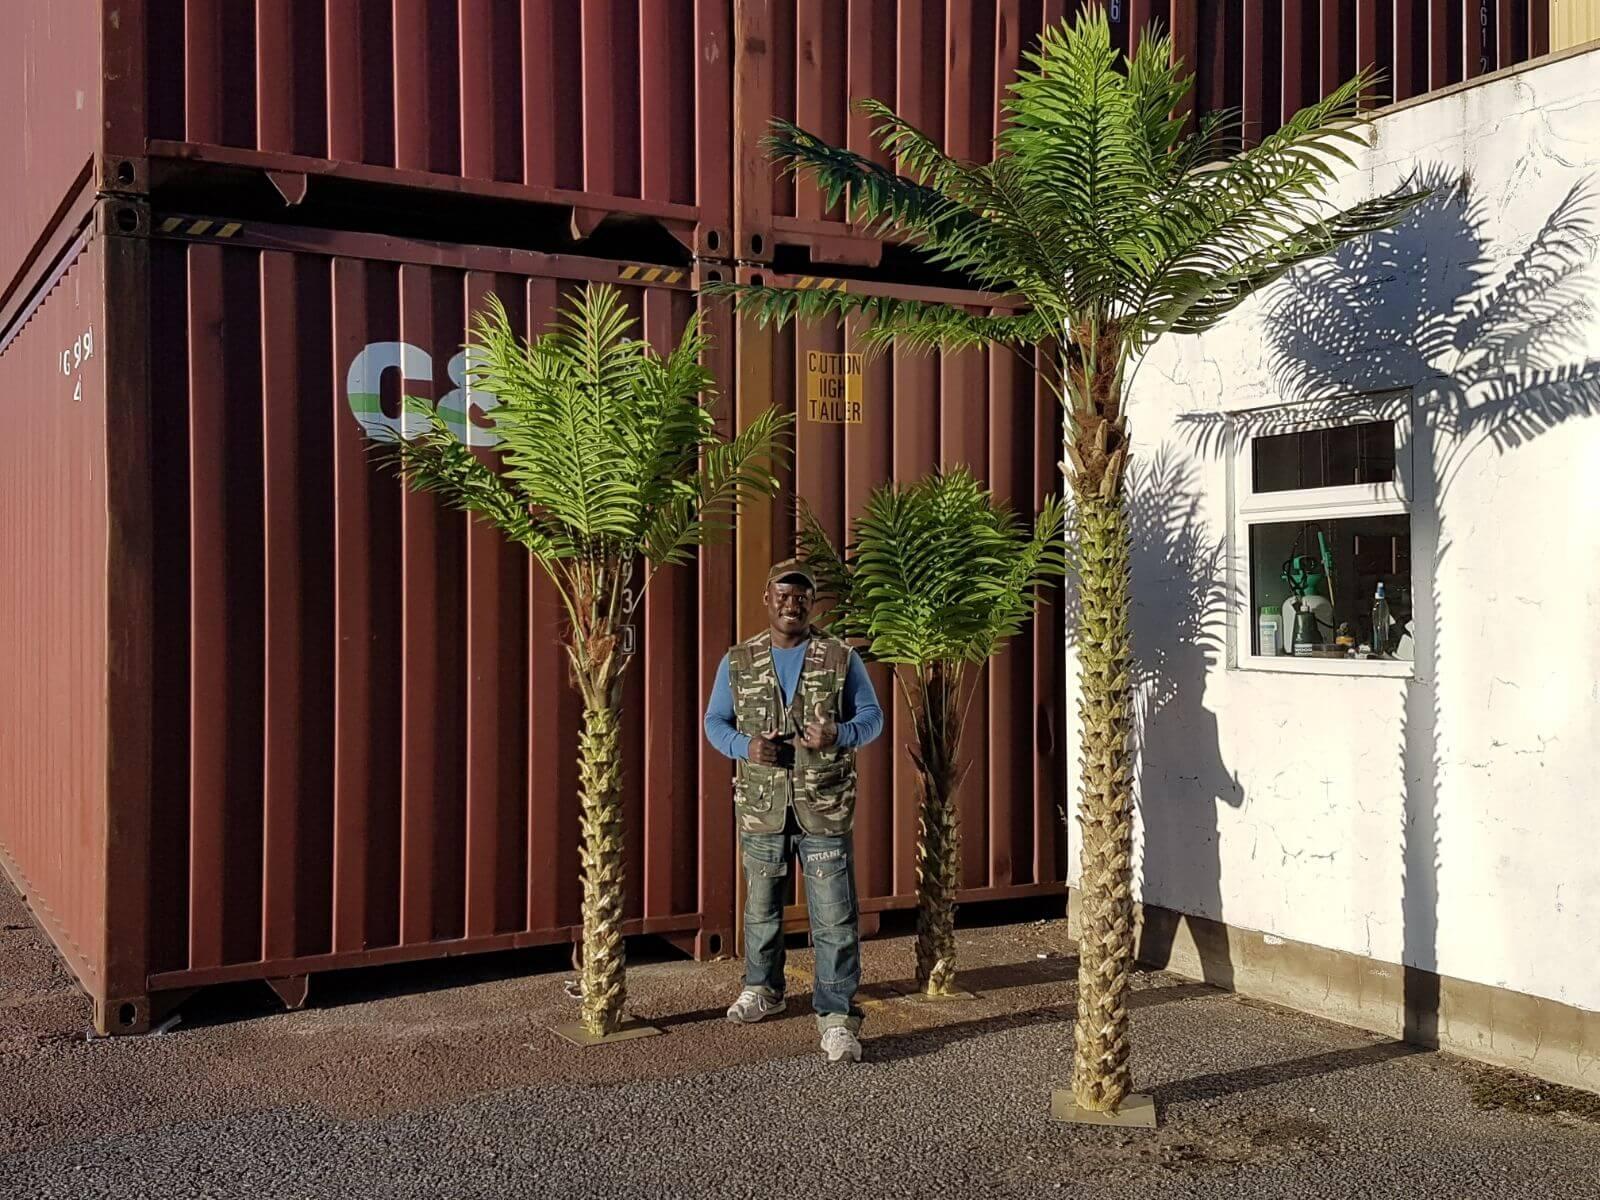 6ft Palm tree